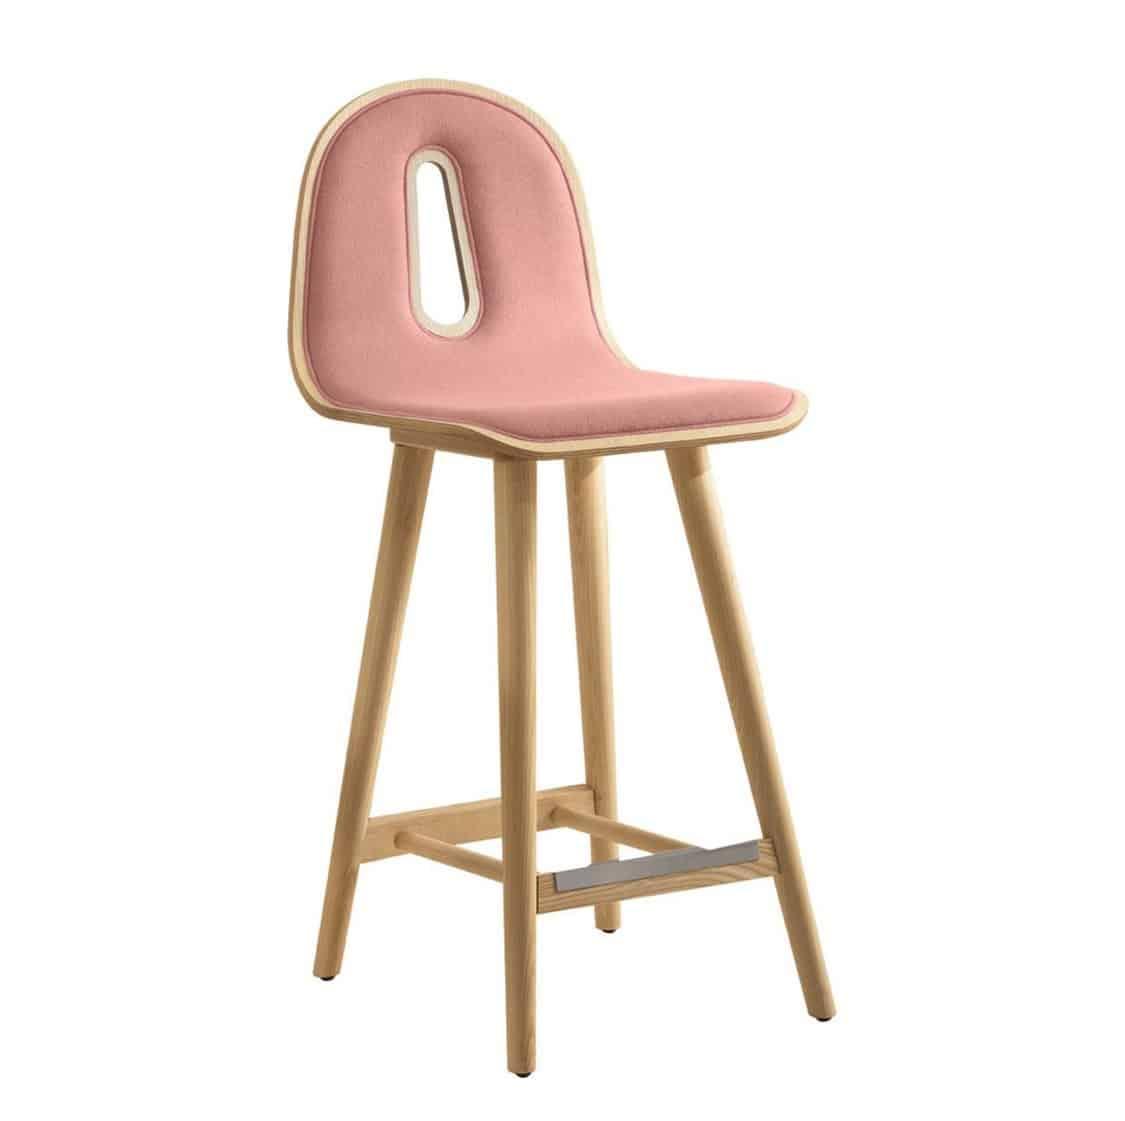 Gotham Woody Bar Stool DeFrae Contract Furniture Pink